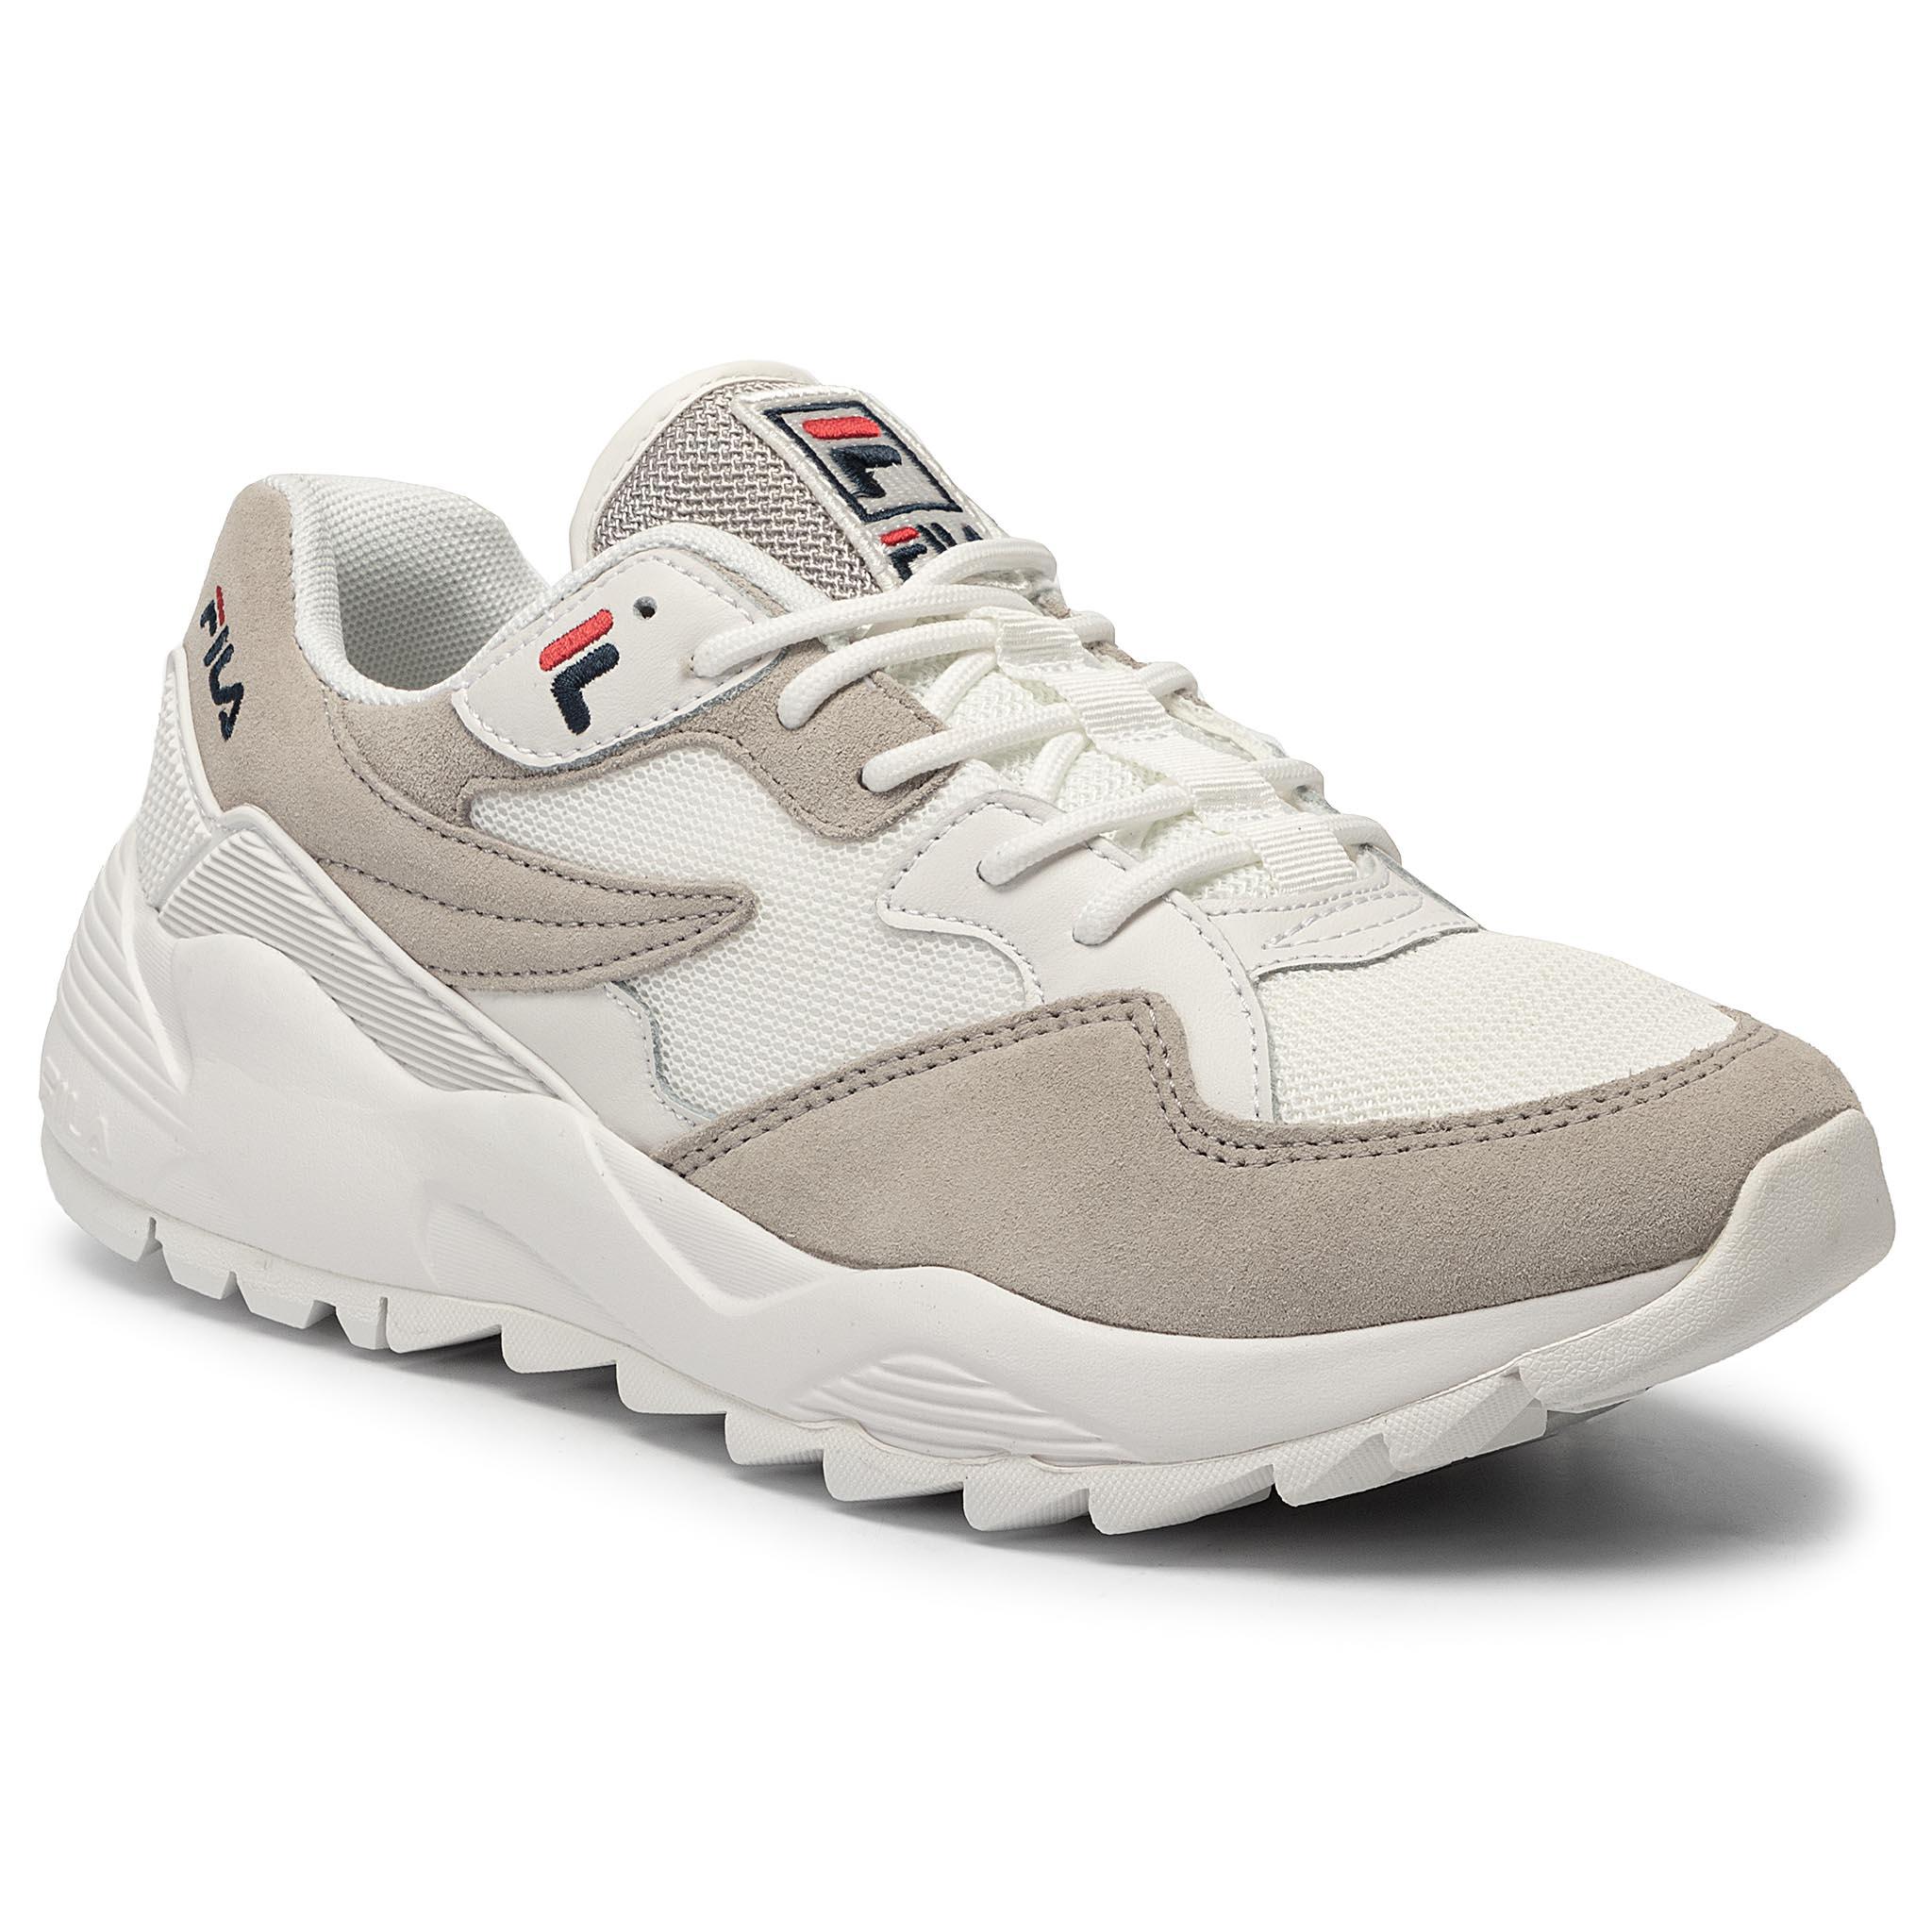 Sneakers FILA Vault Cmr Jogger L Low 1010587.1FG White